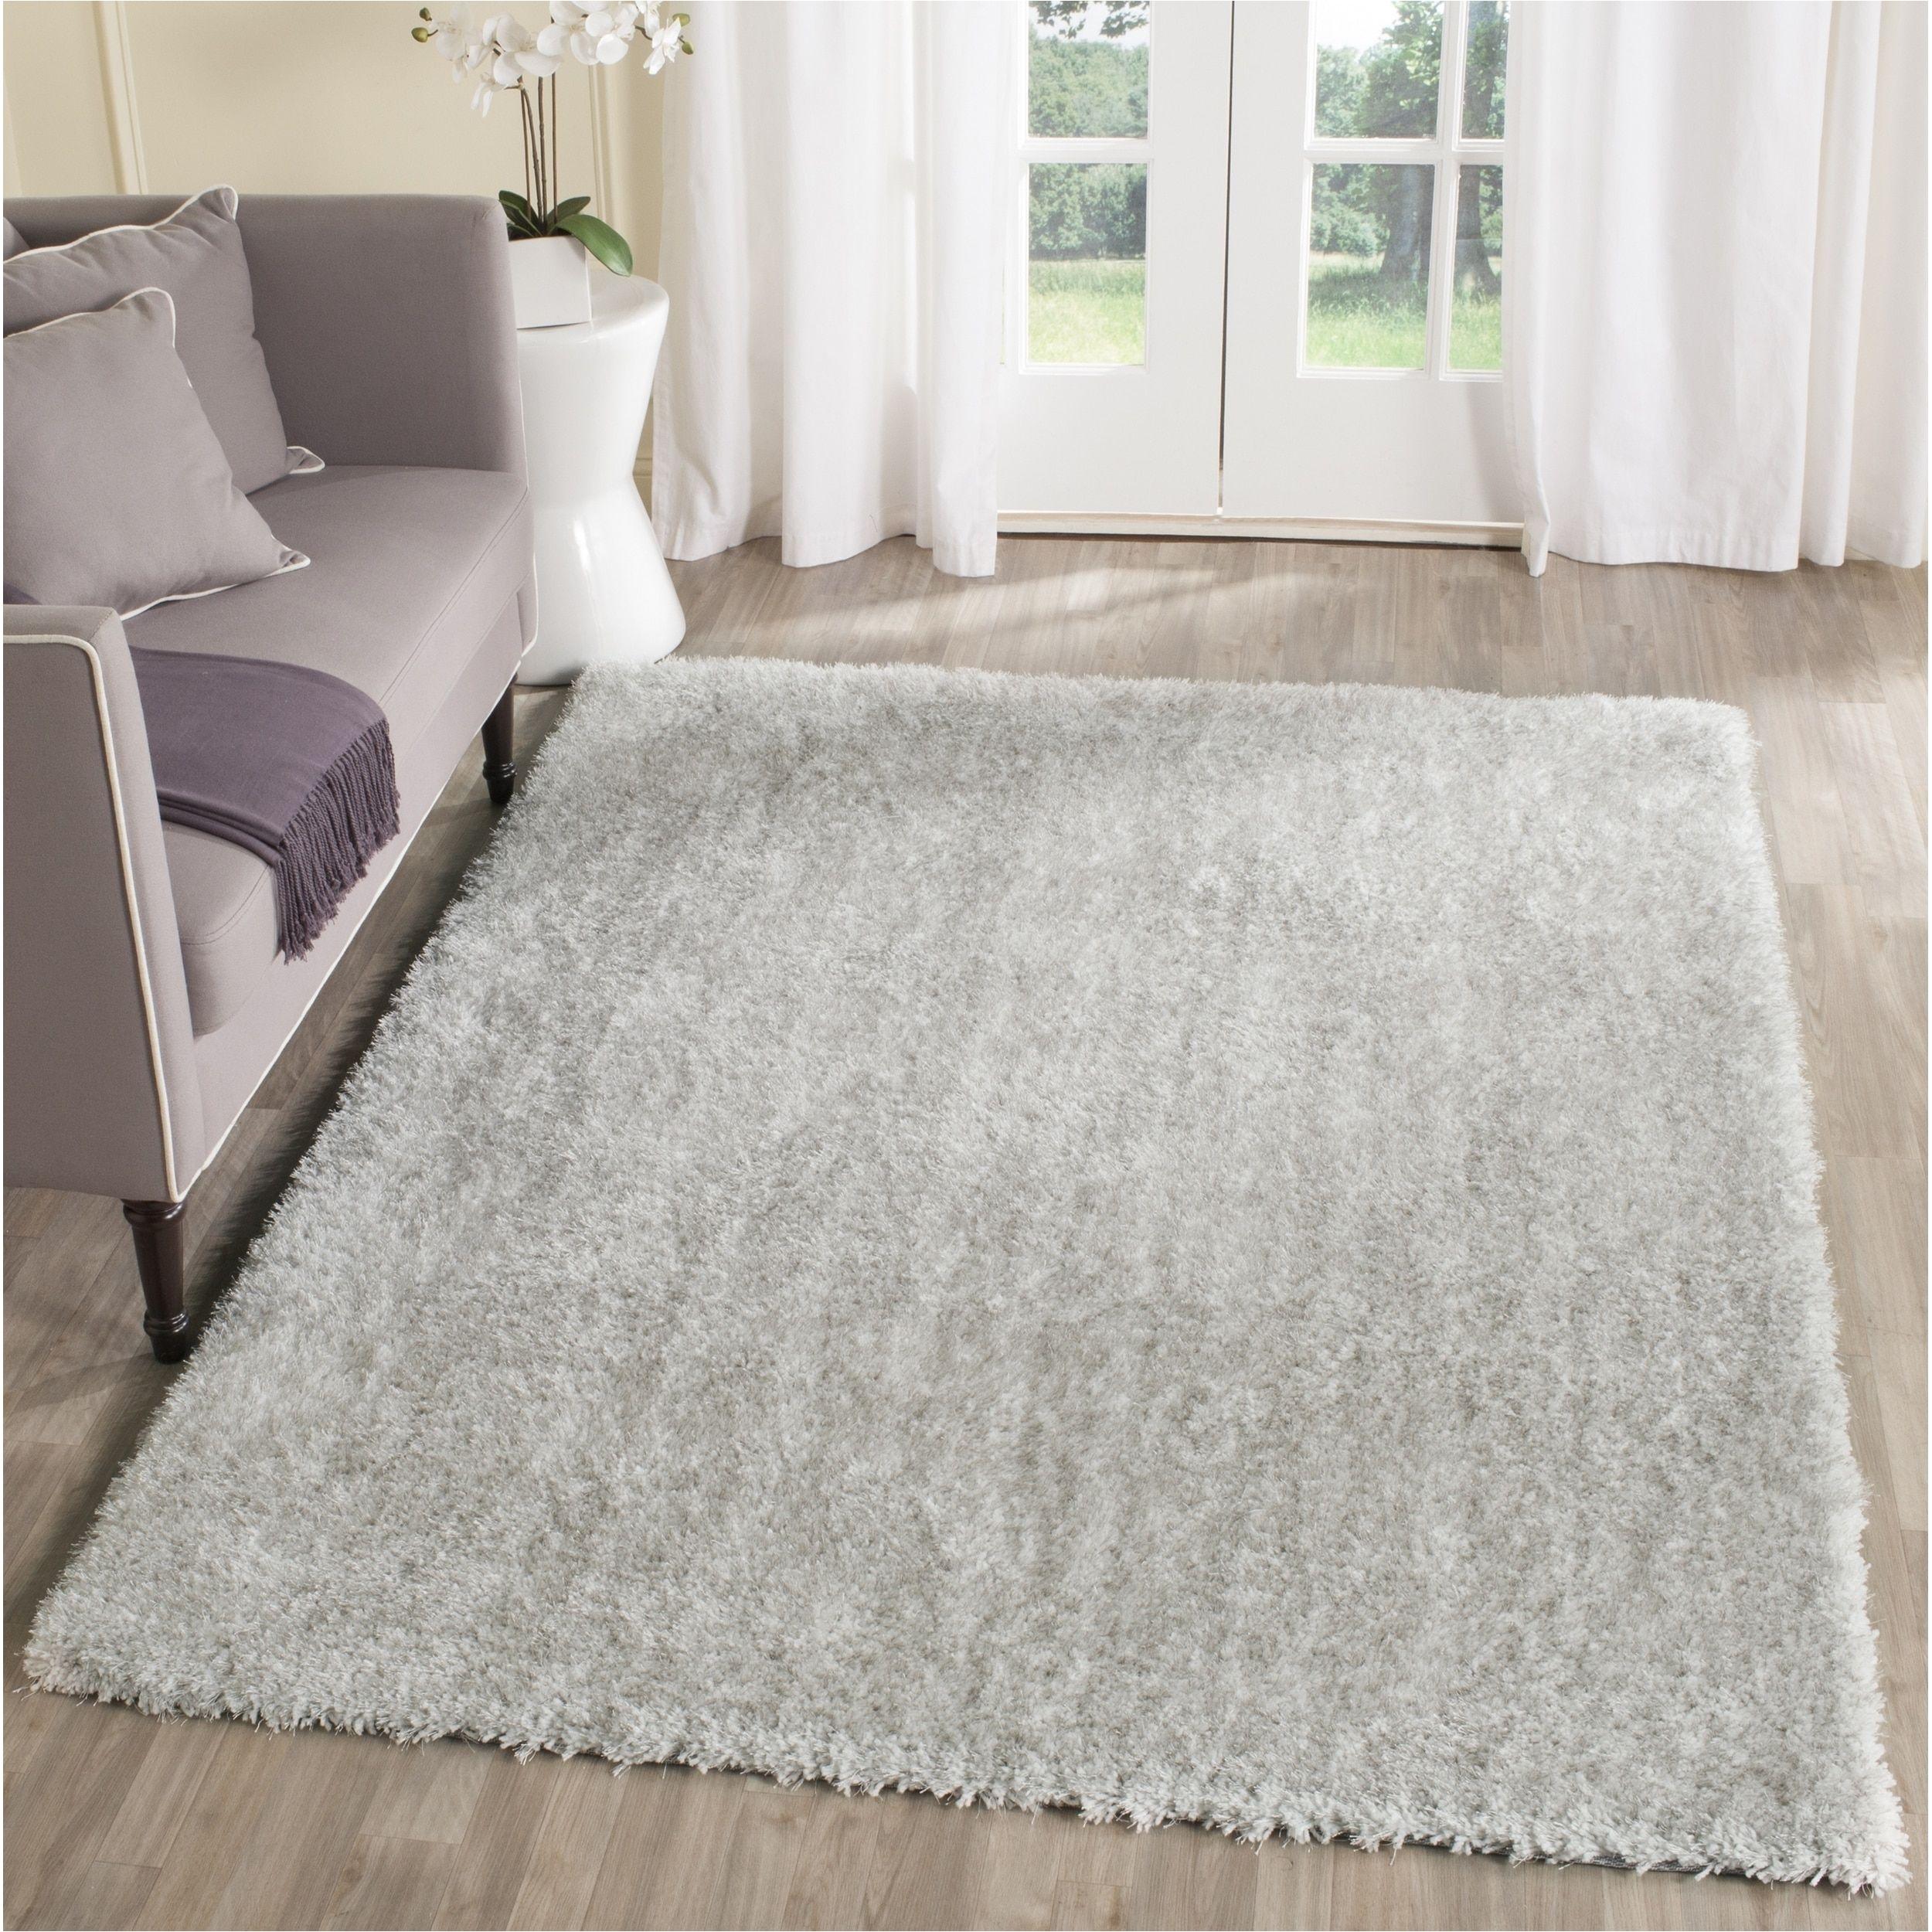 safavieh toronto handmade ivory light grey shag rug 4 x 6 sgtw711a 4 size 4 x 6 polyester geometric